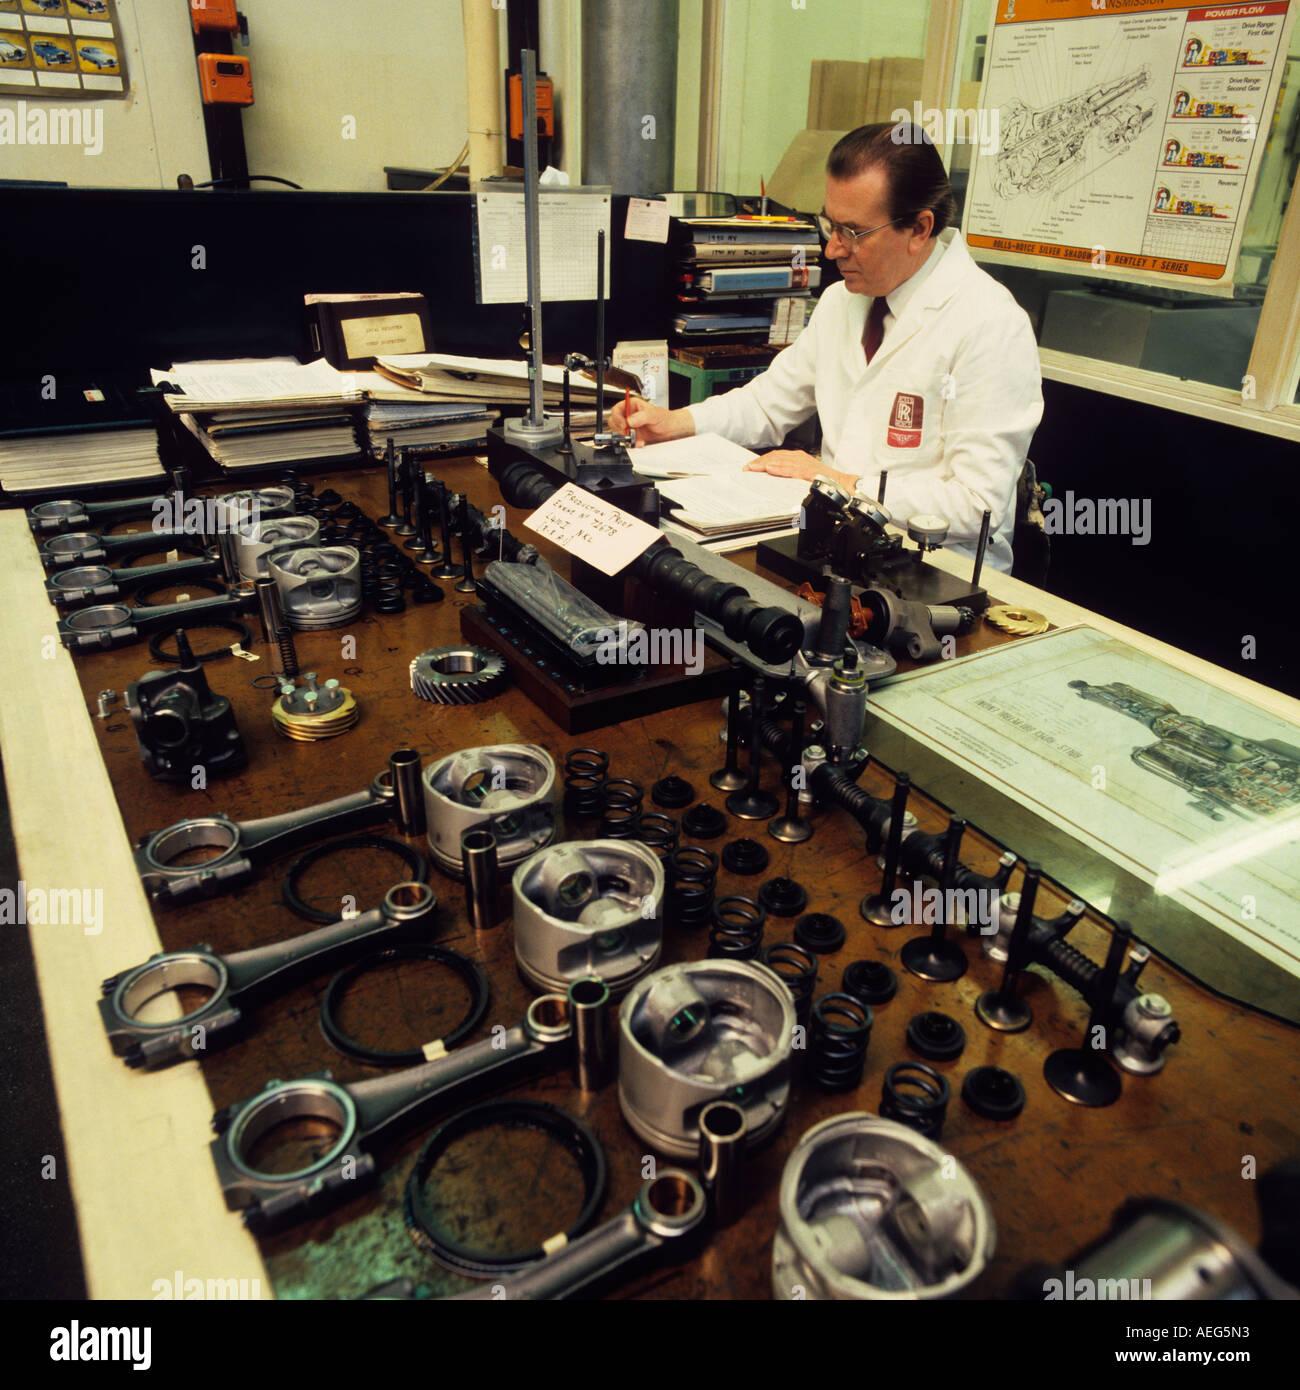 Cheshire Crewe Car Making Rolls Royce Engineer Inspecting